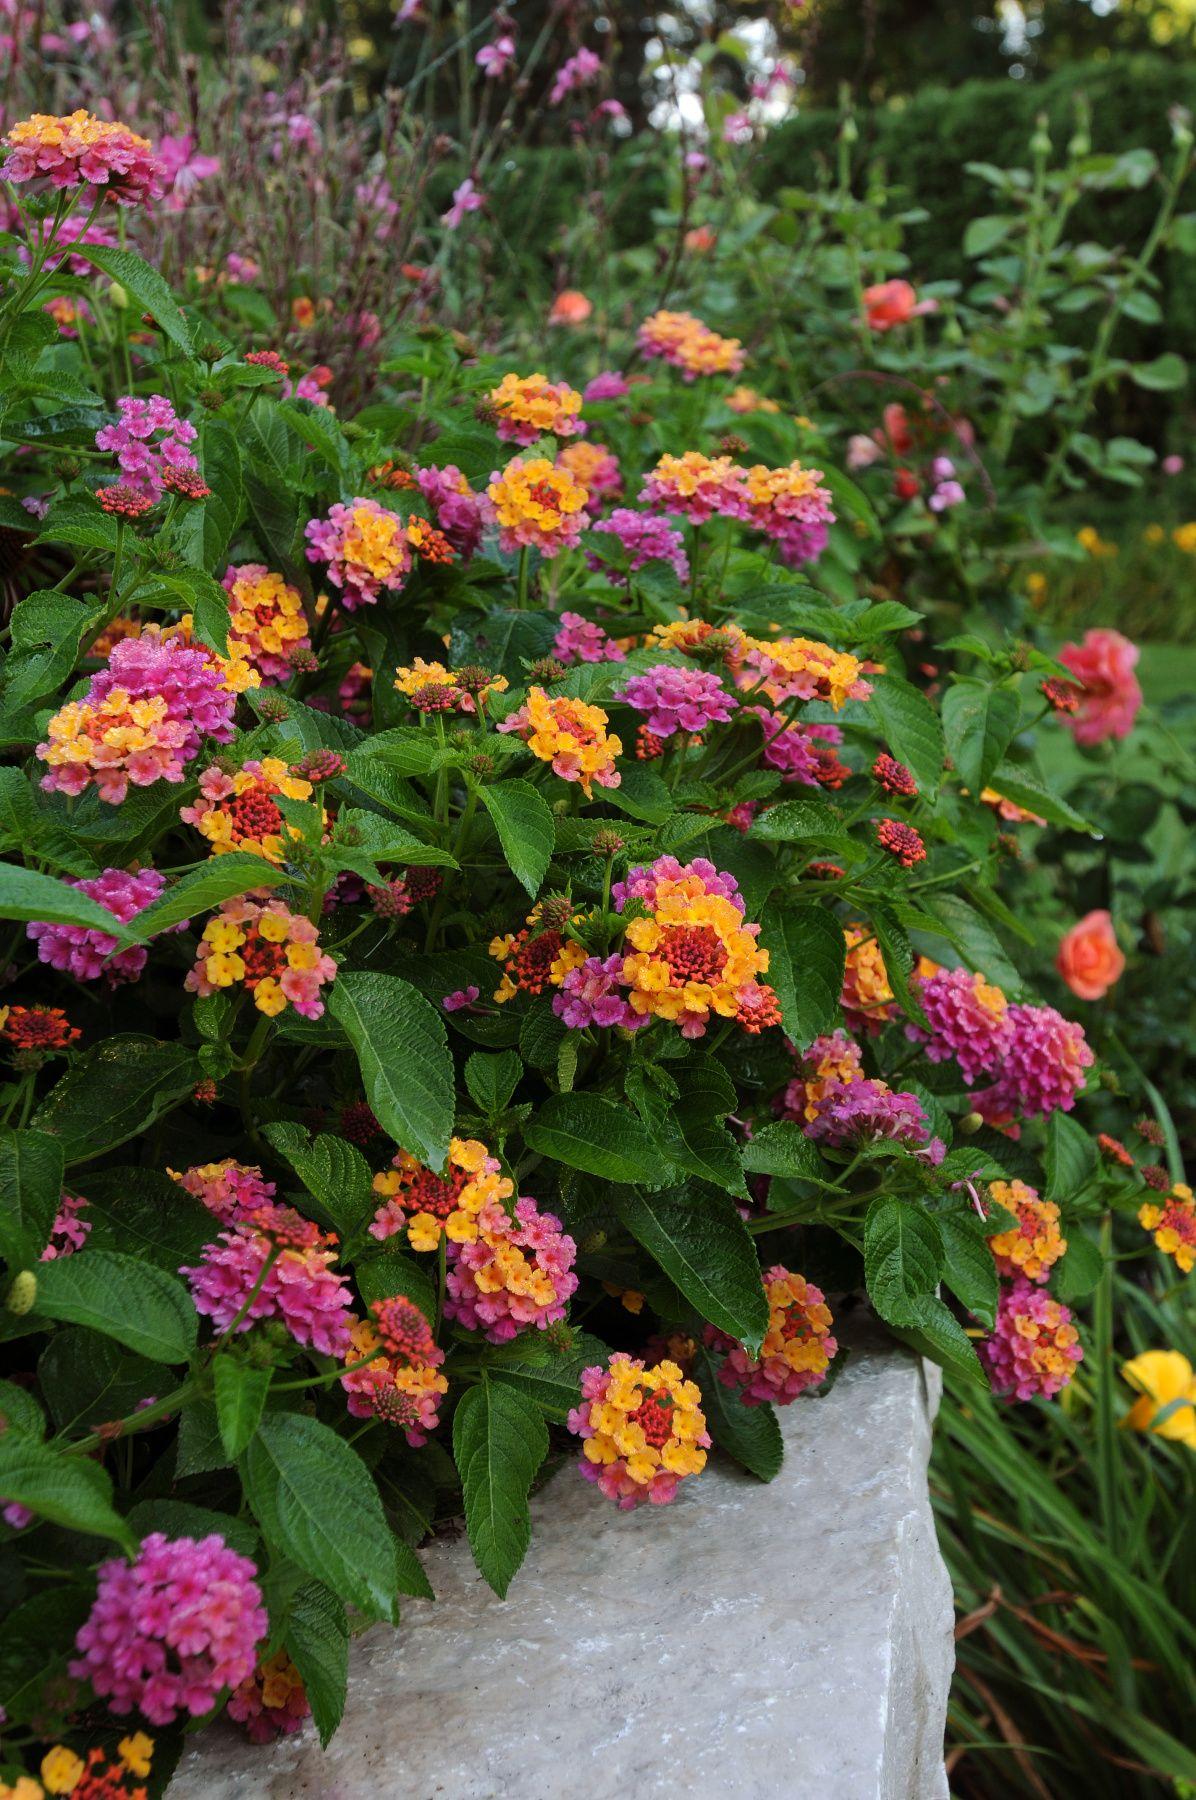 Lantana Pictures National Garden Bureau In 2020 Heat Tolerant Plants Plants Drought Tolerant Garden